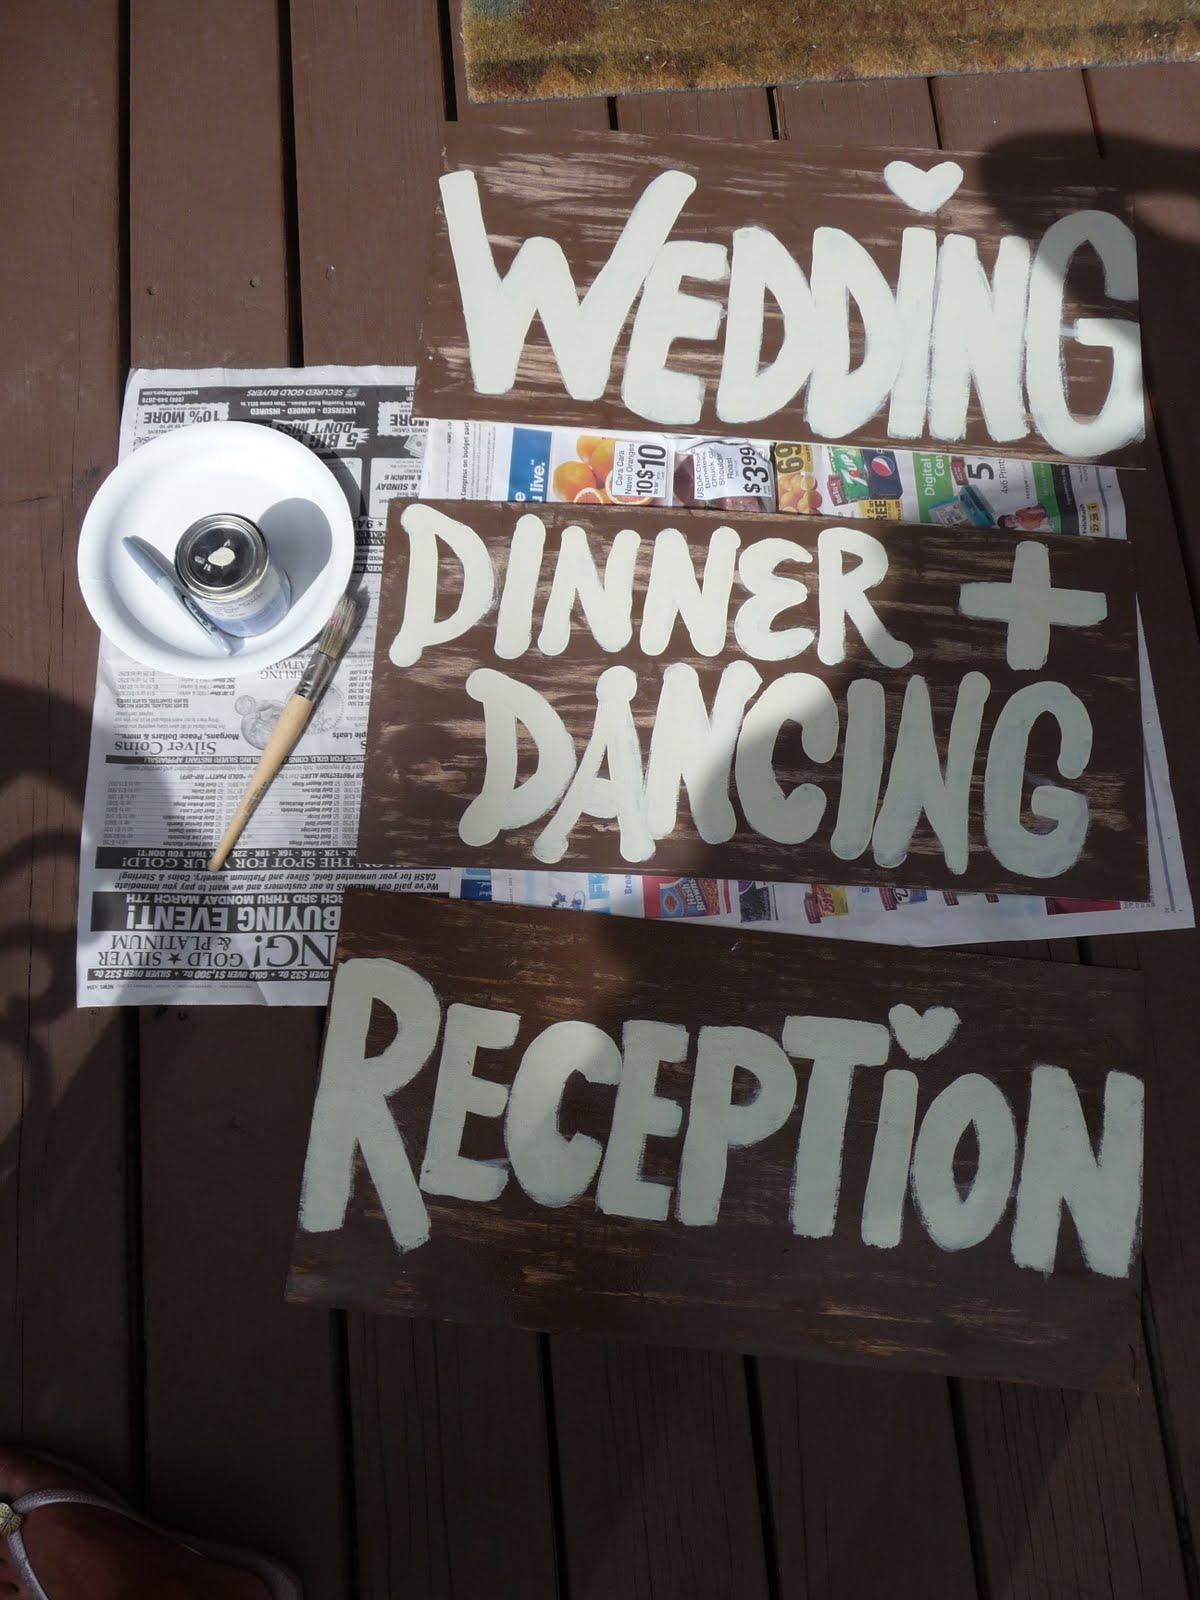 Vintage Amp Lace Weddings Vintage Wedding Signs DIY Project